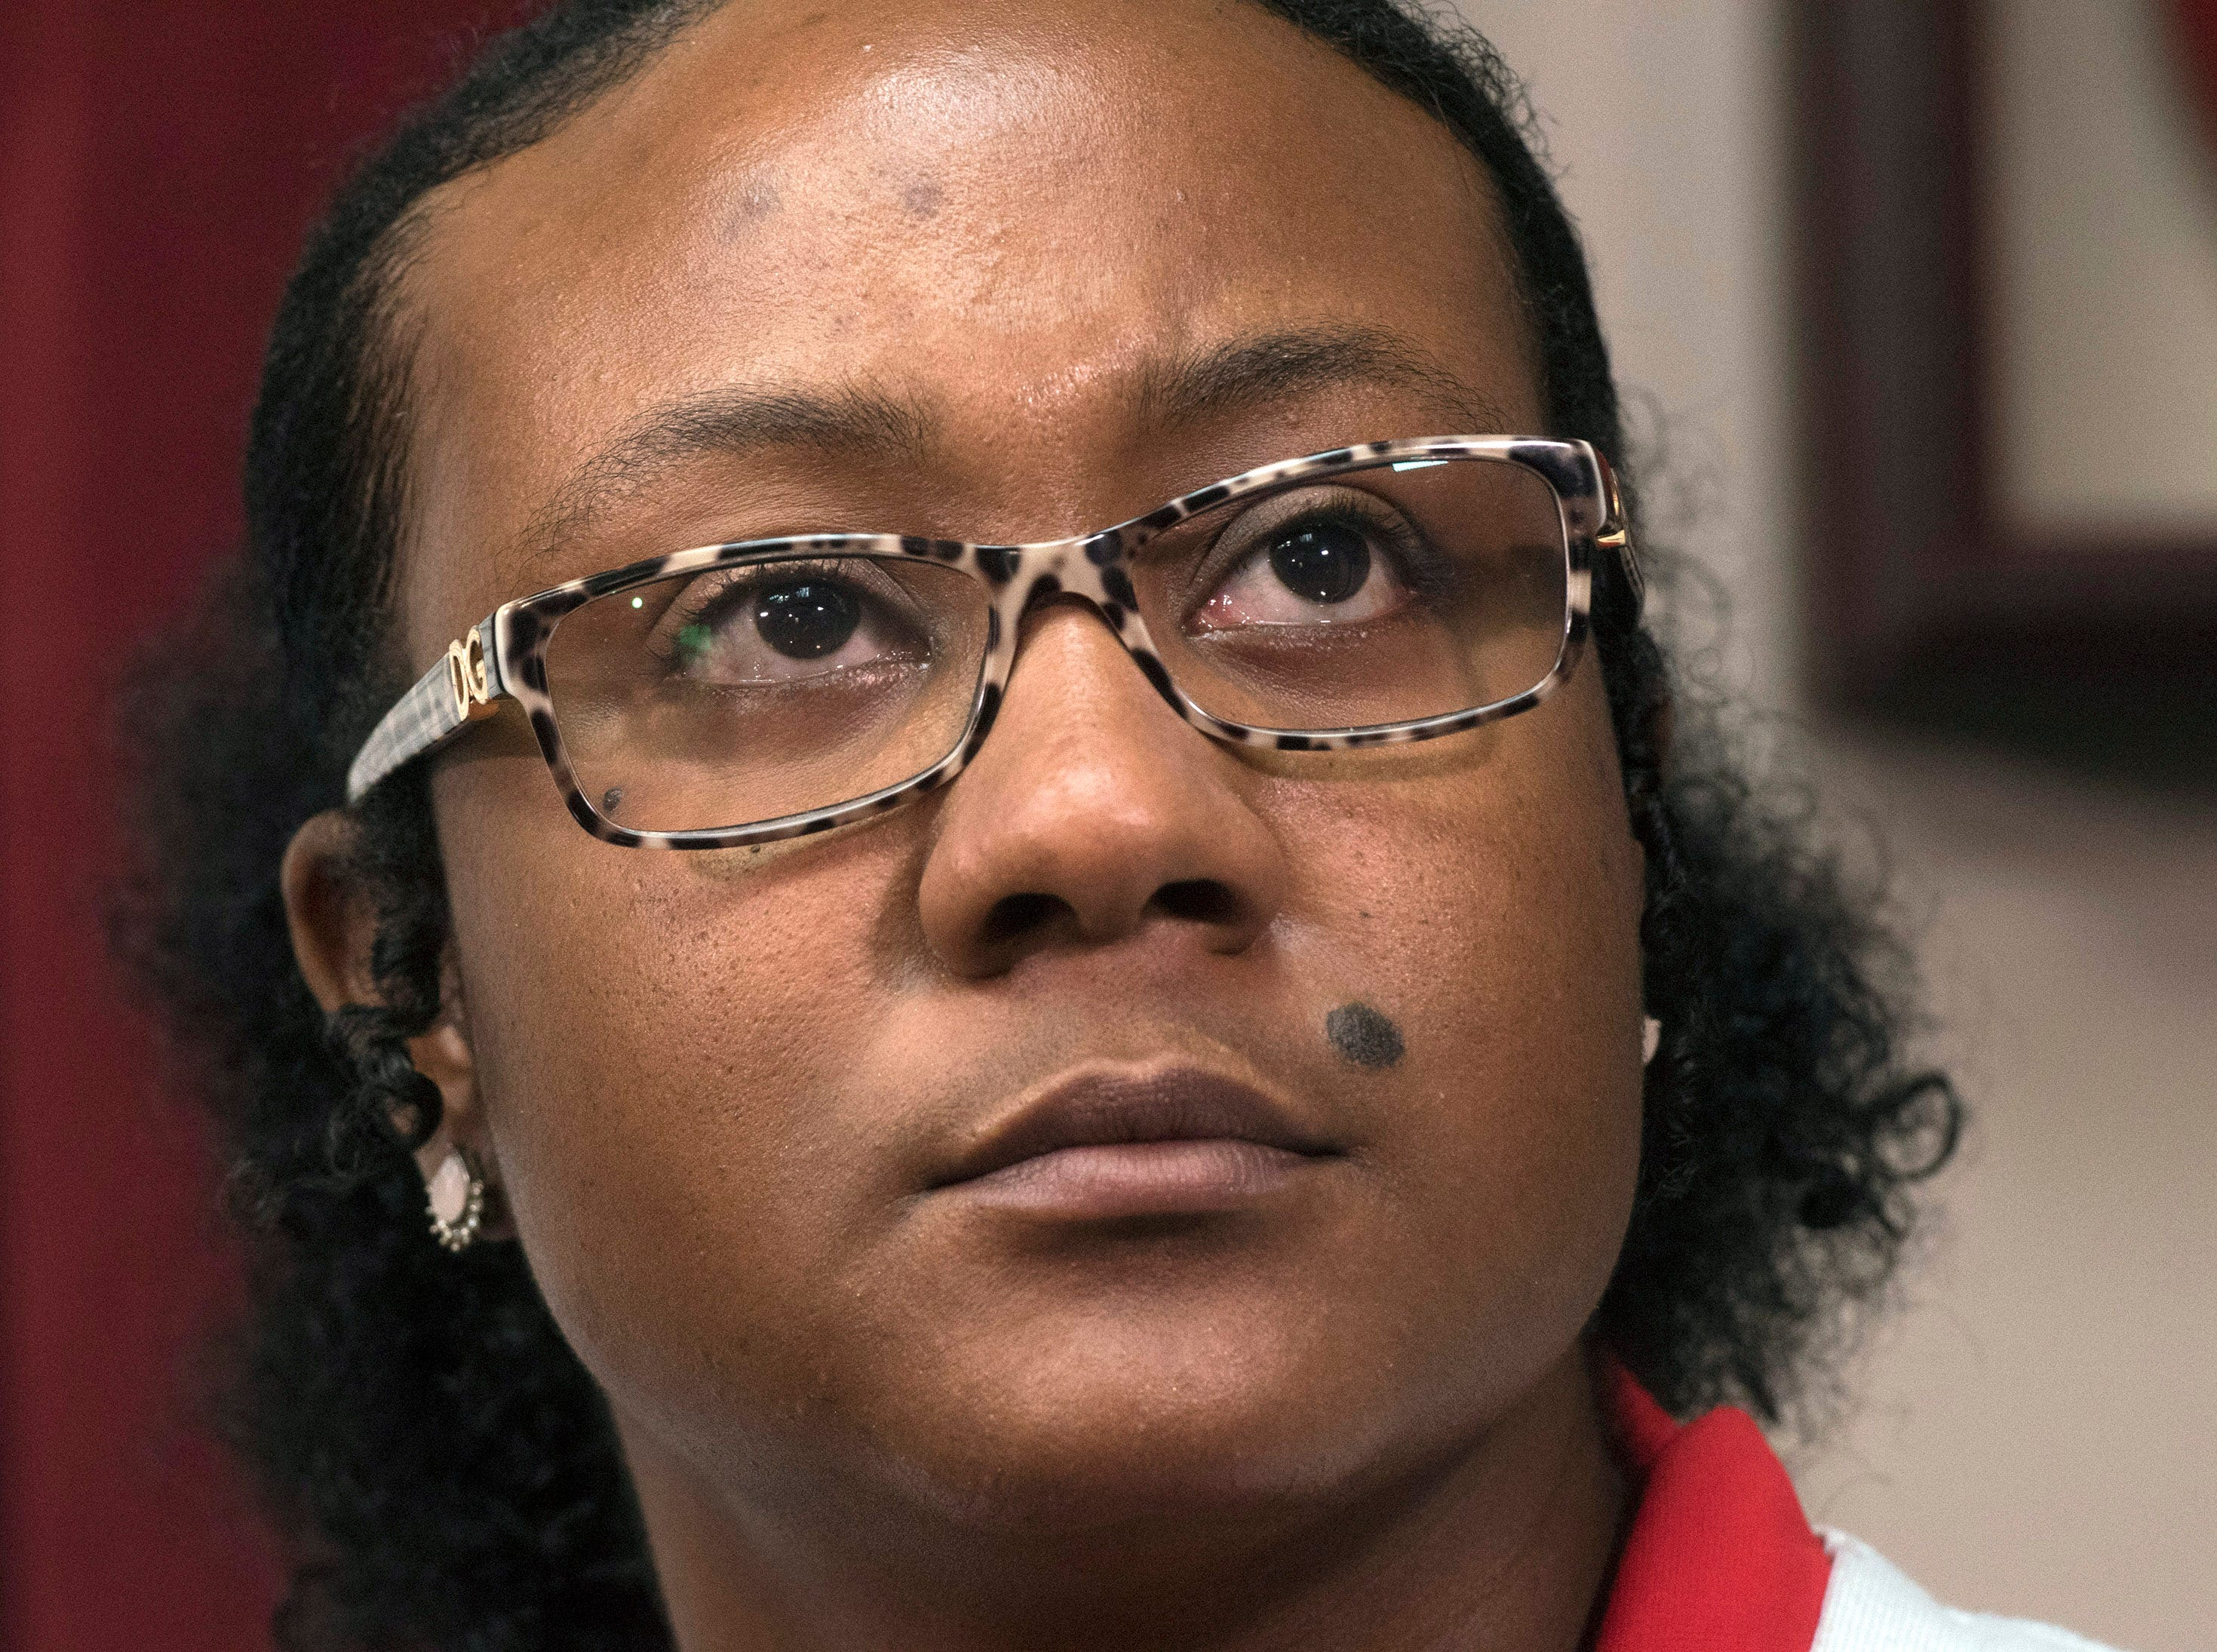 PHOTOS: Naomi Jones' family sues apartments over death